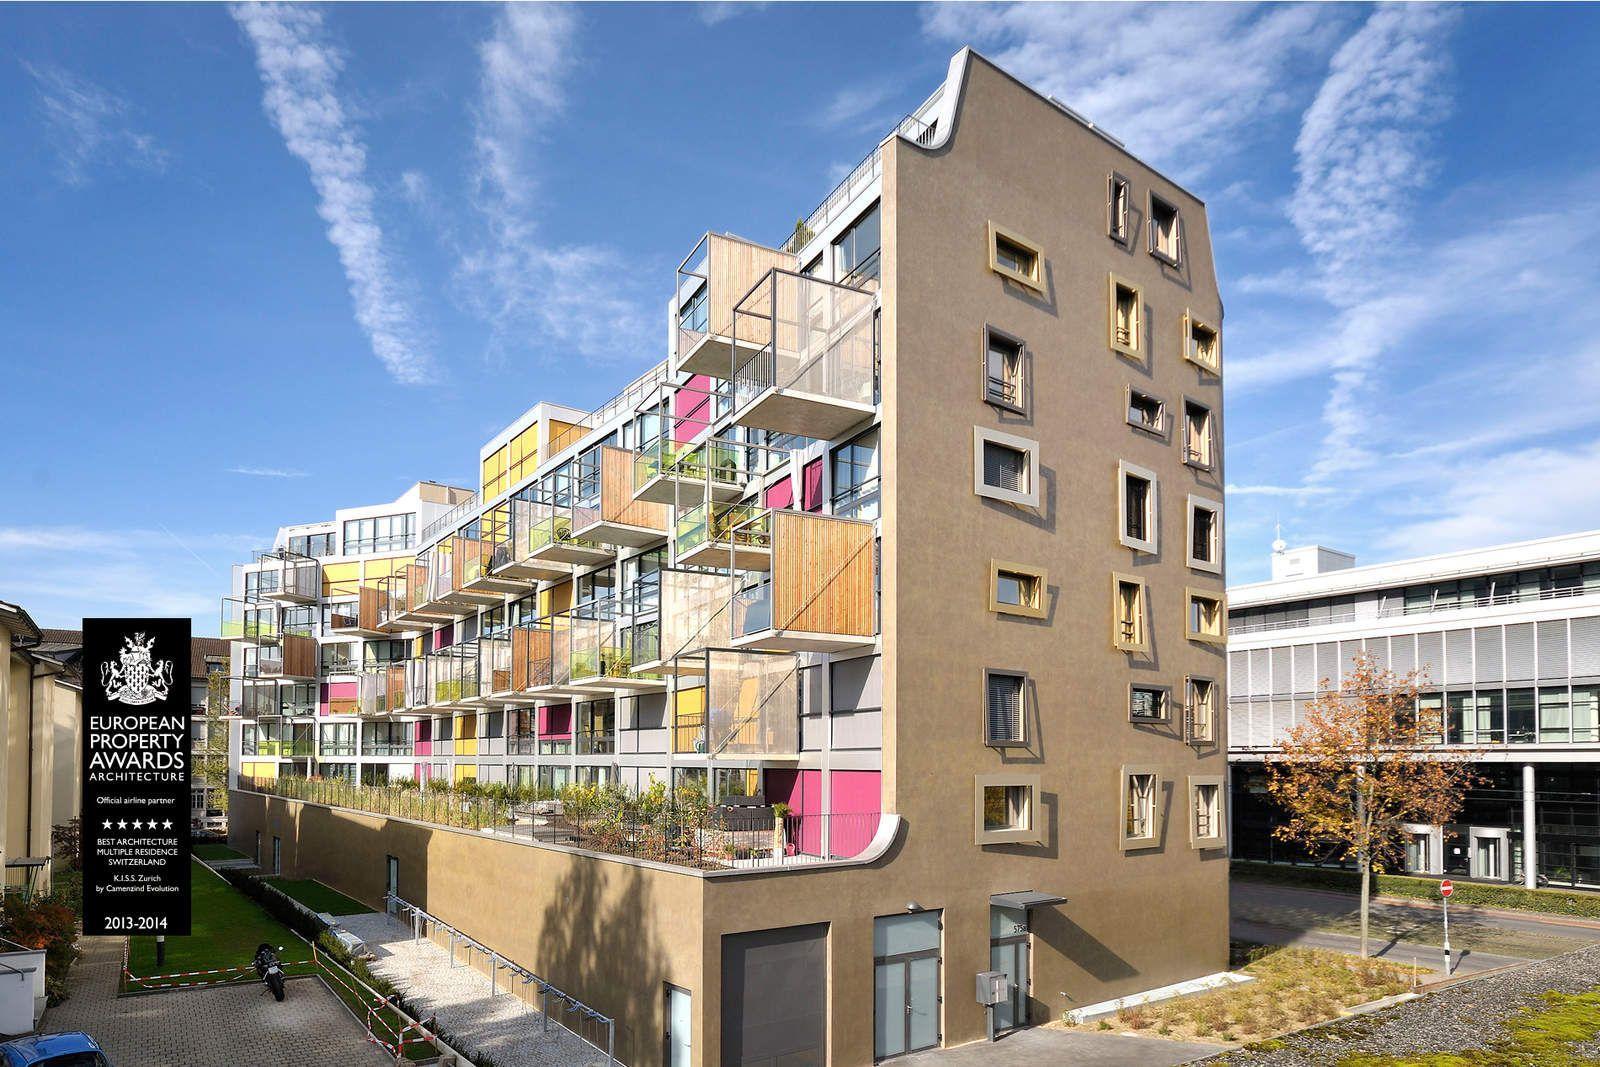 K.I.S.S. Apartment Building By Camenzind Evolution, Zurich